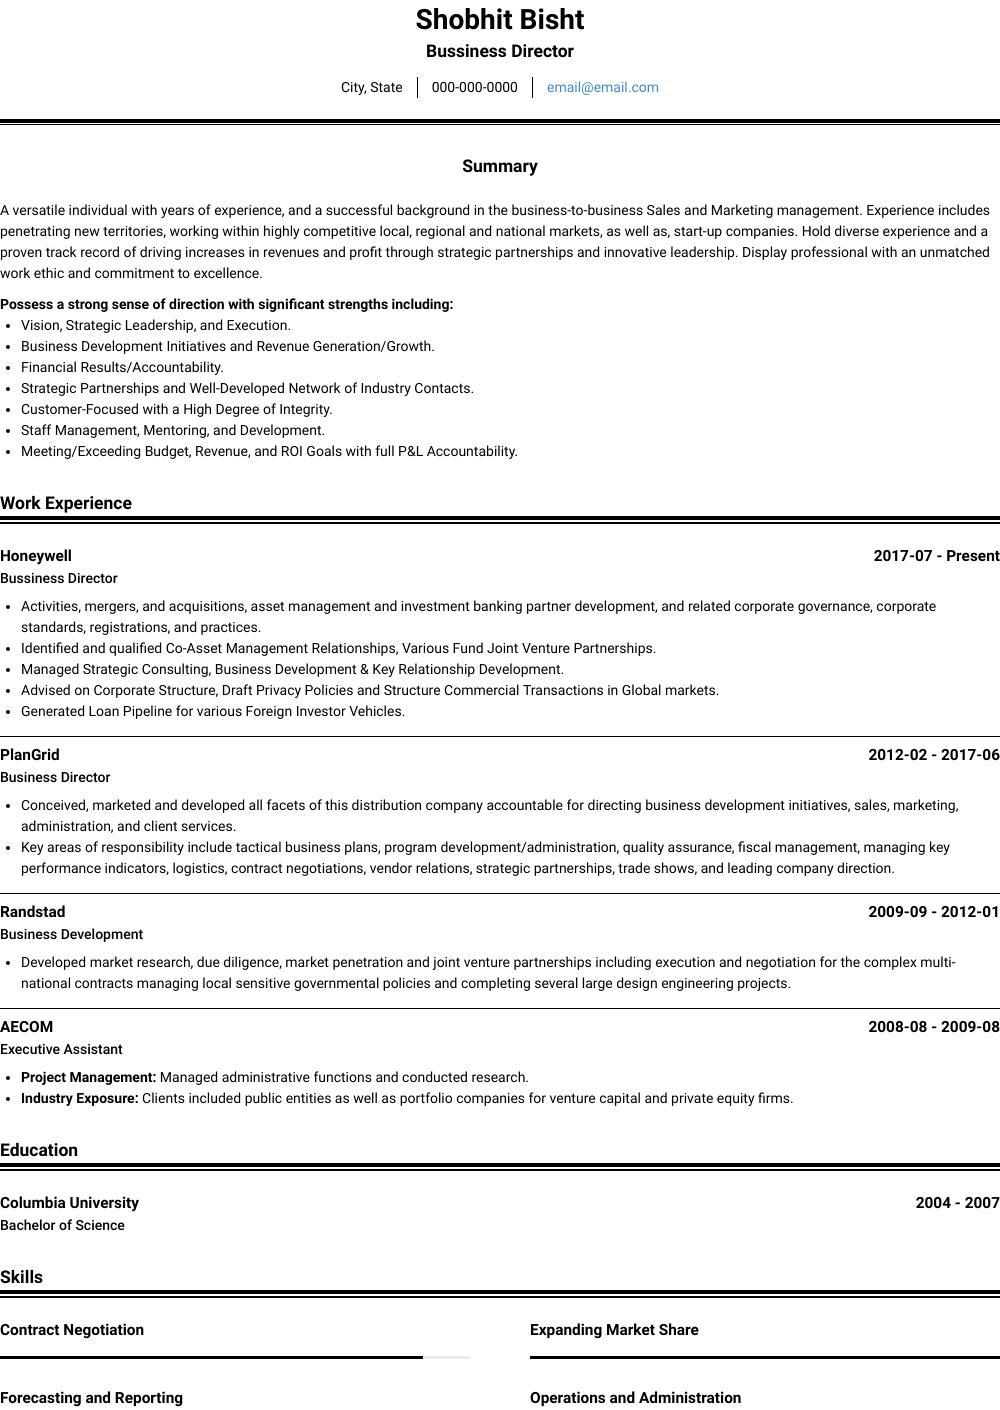 Business Director - Resume Samples & Templates | VisualCV